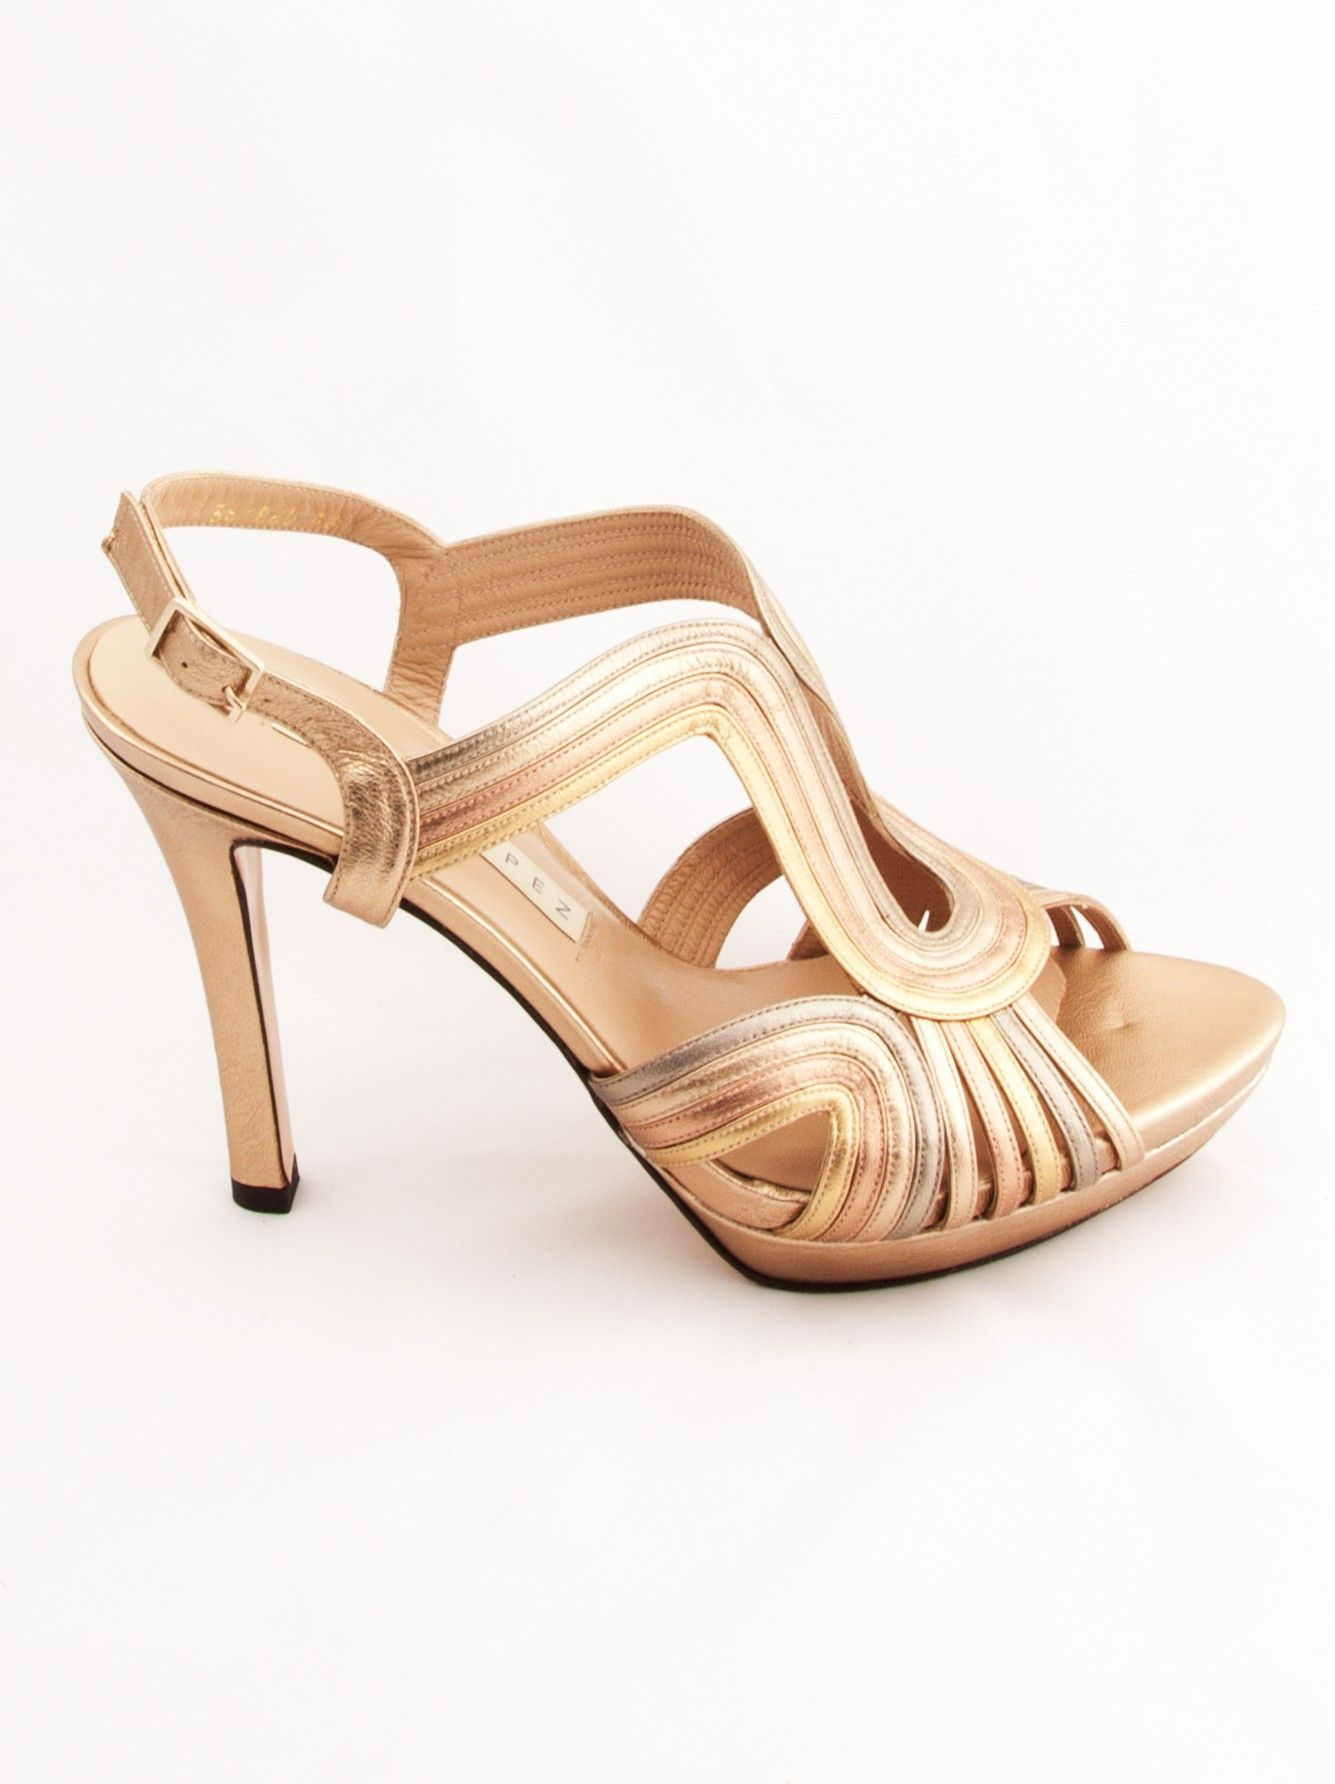 44fe9afb2ca Goodchic.com-Sandalias de Pura López de hondas con plataforma en colores  oro claro